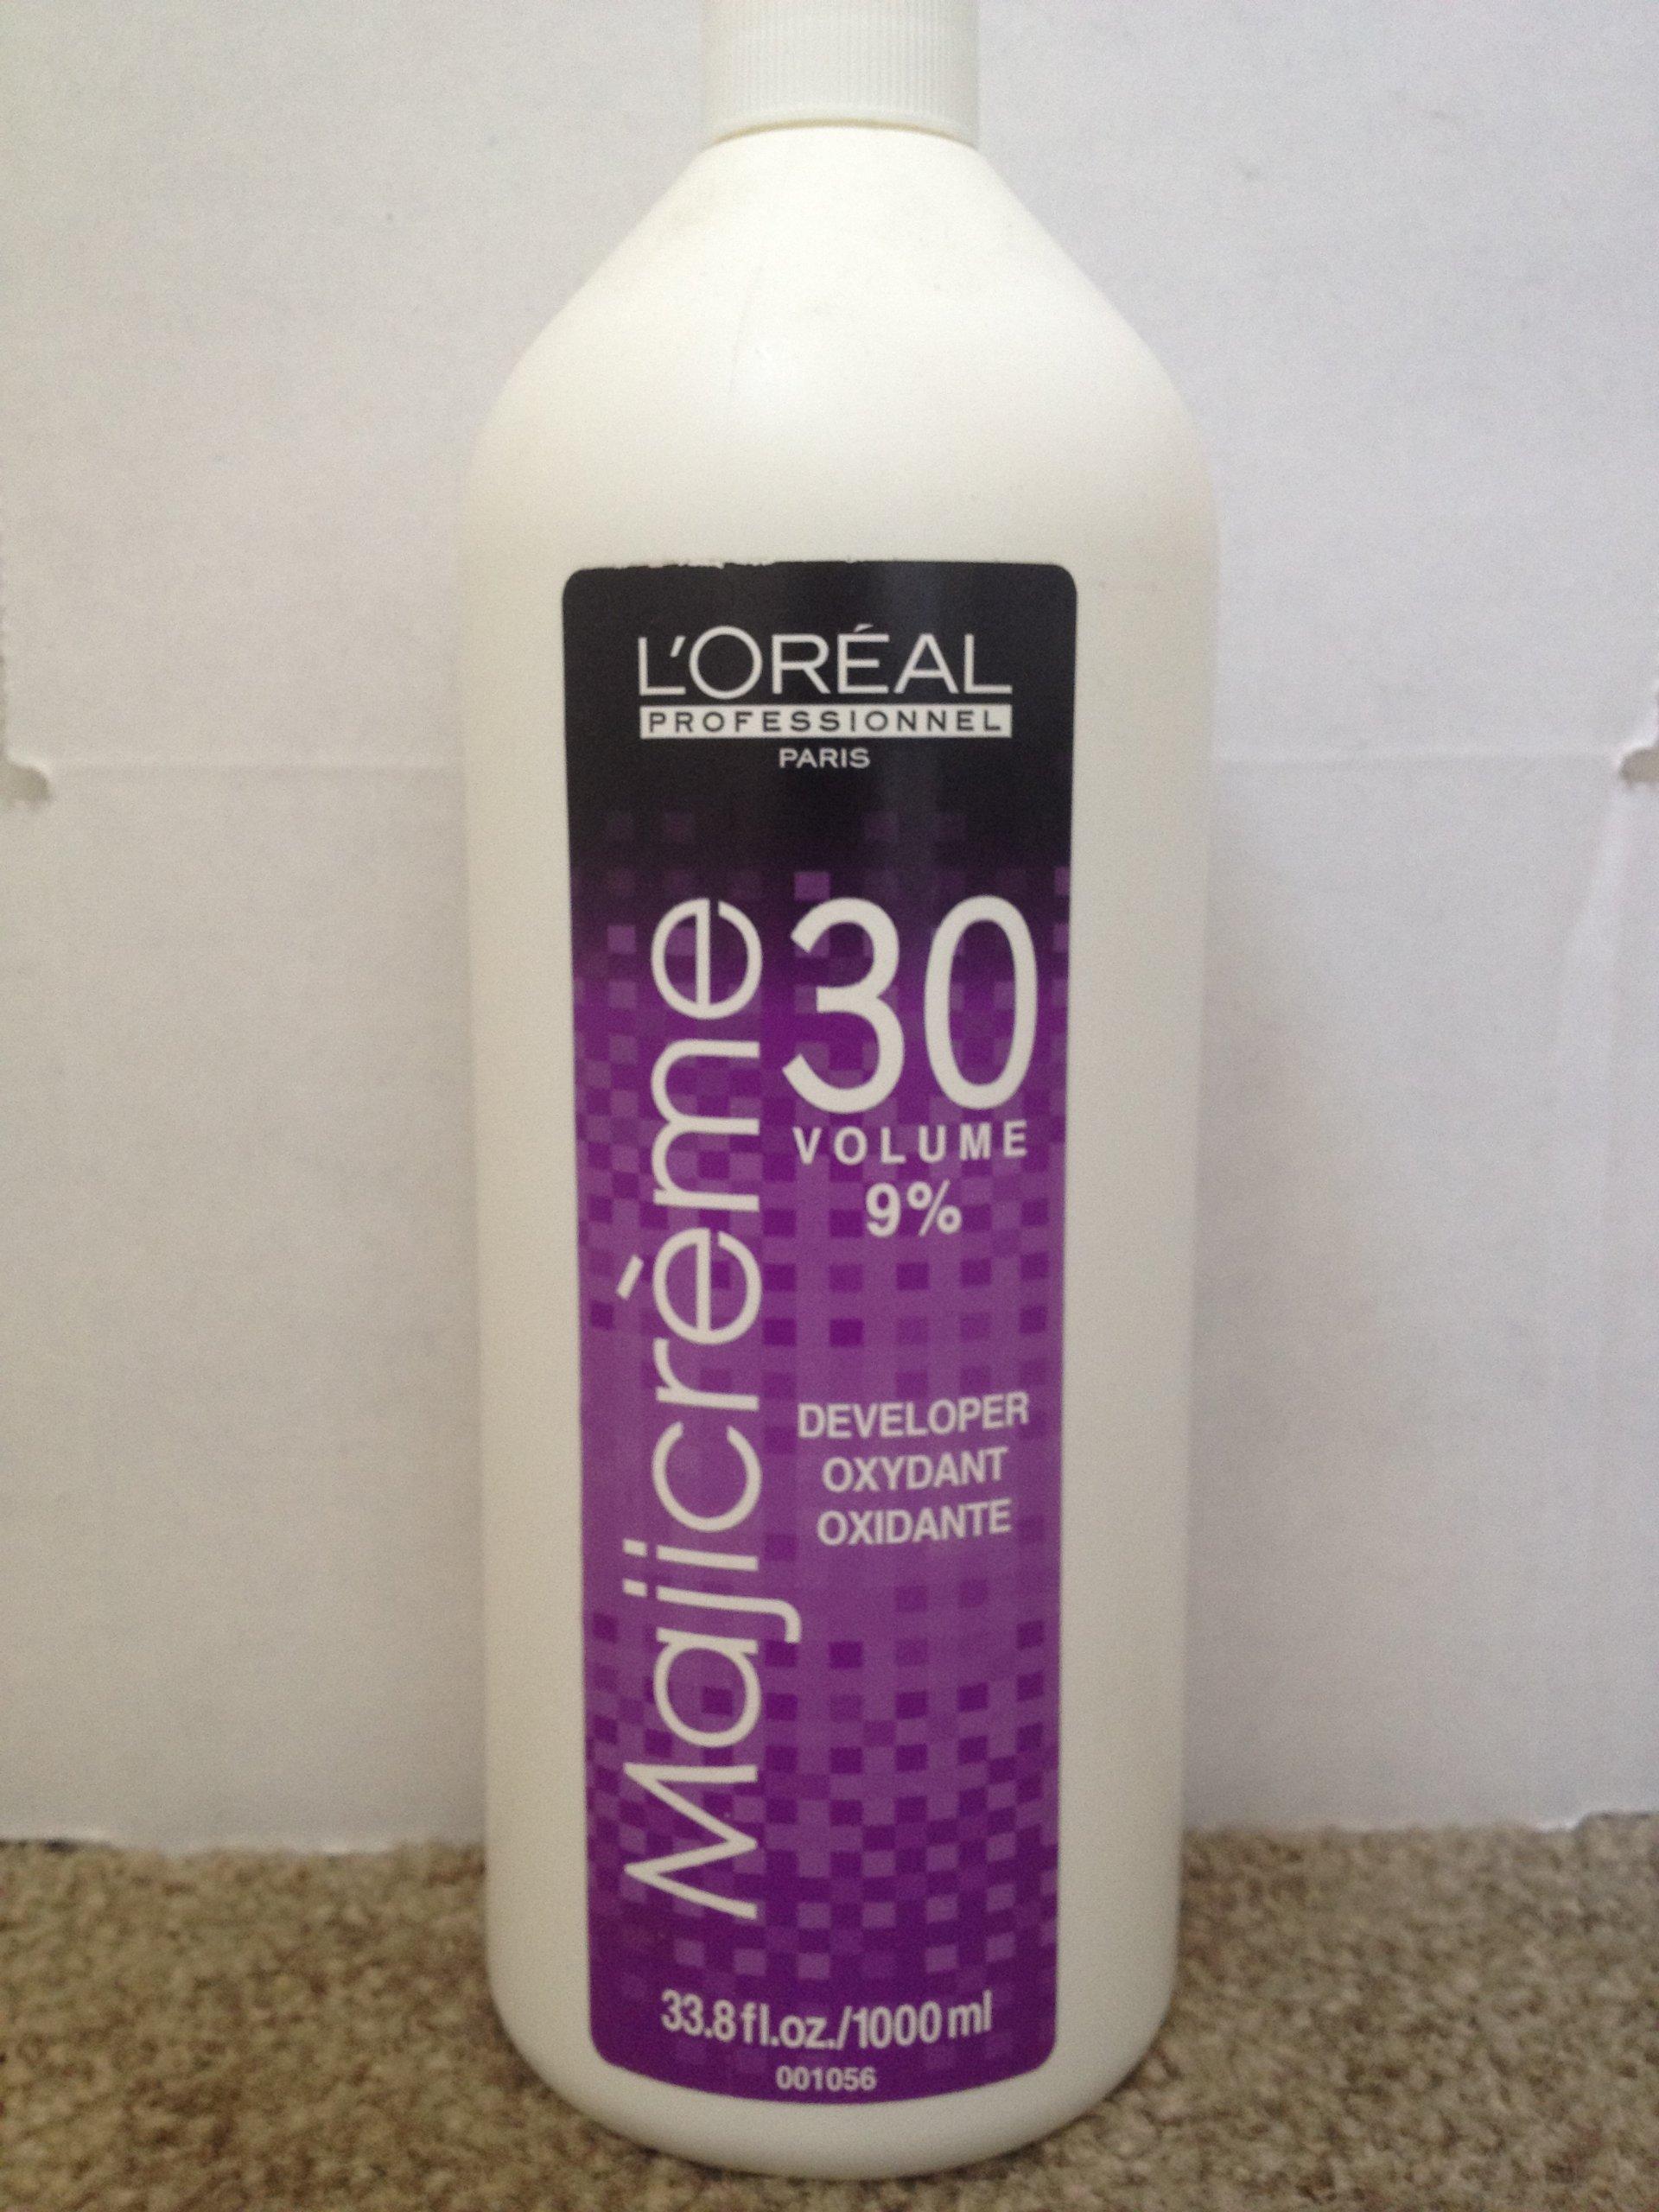 Loreal Maji Creme Developer Lotion 30 Volume 9% 33.8 oz